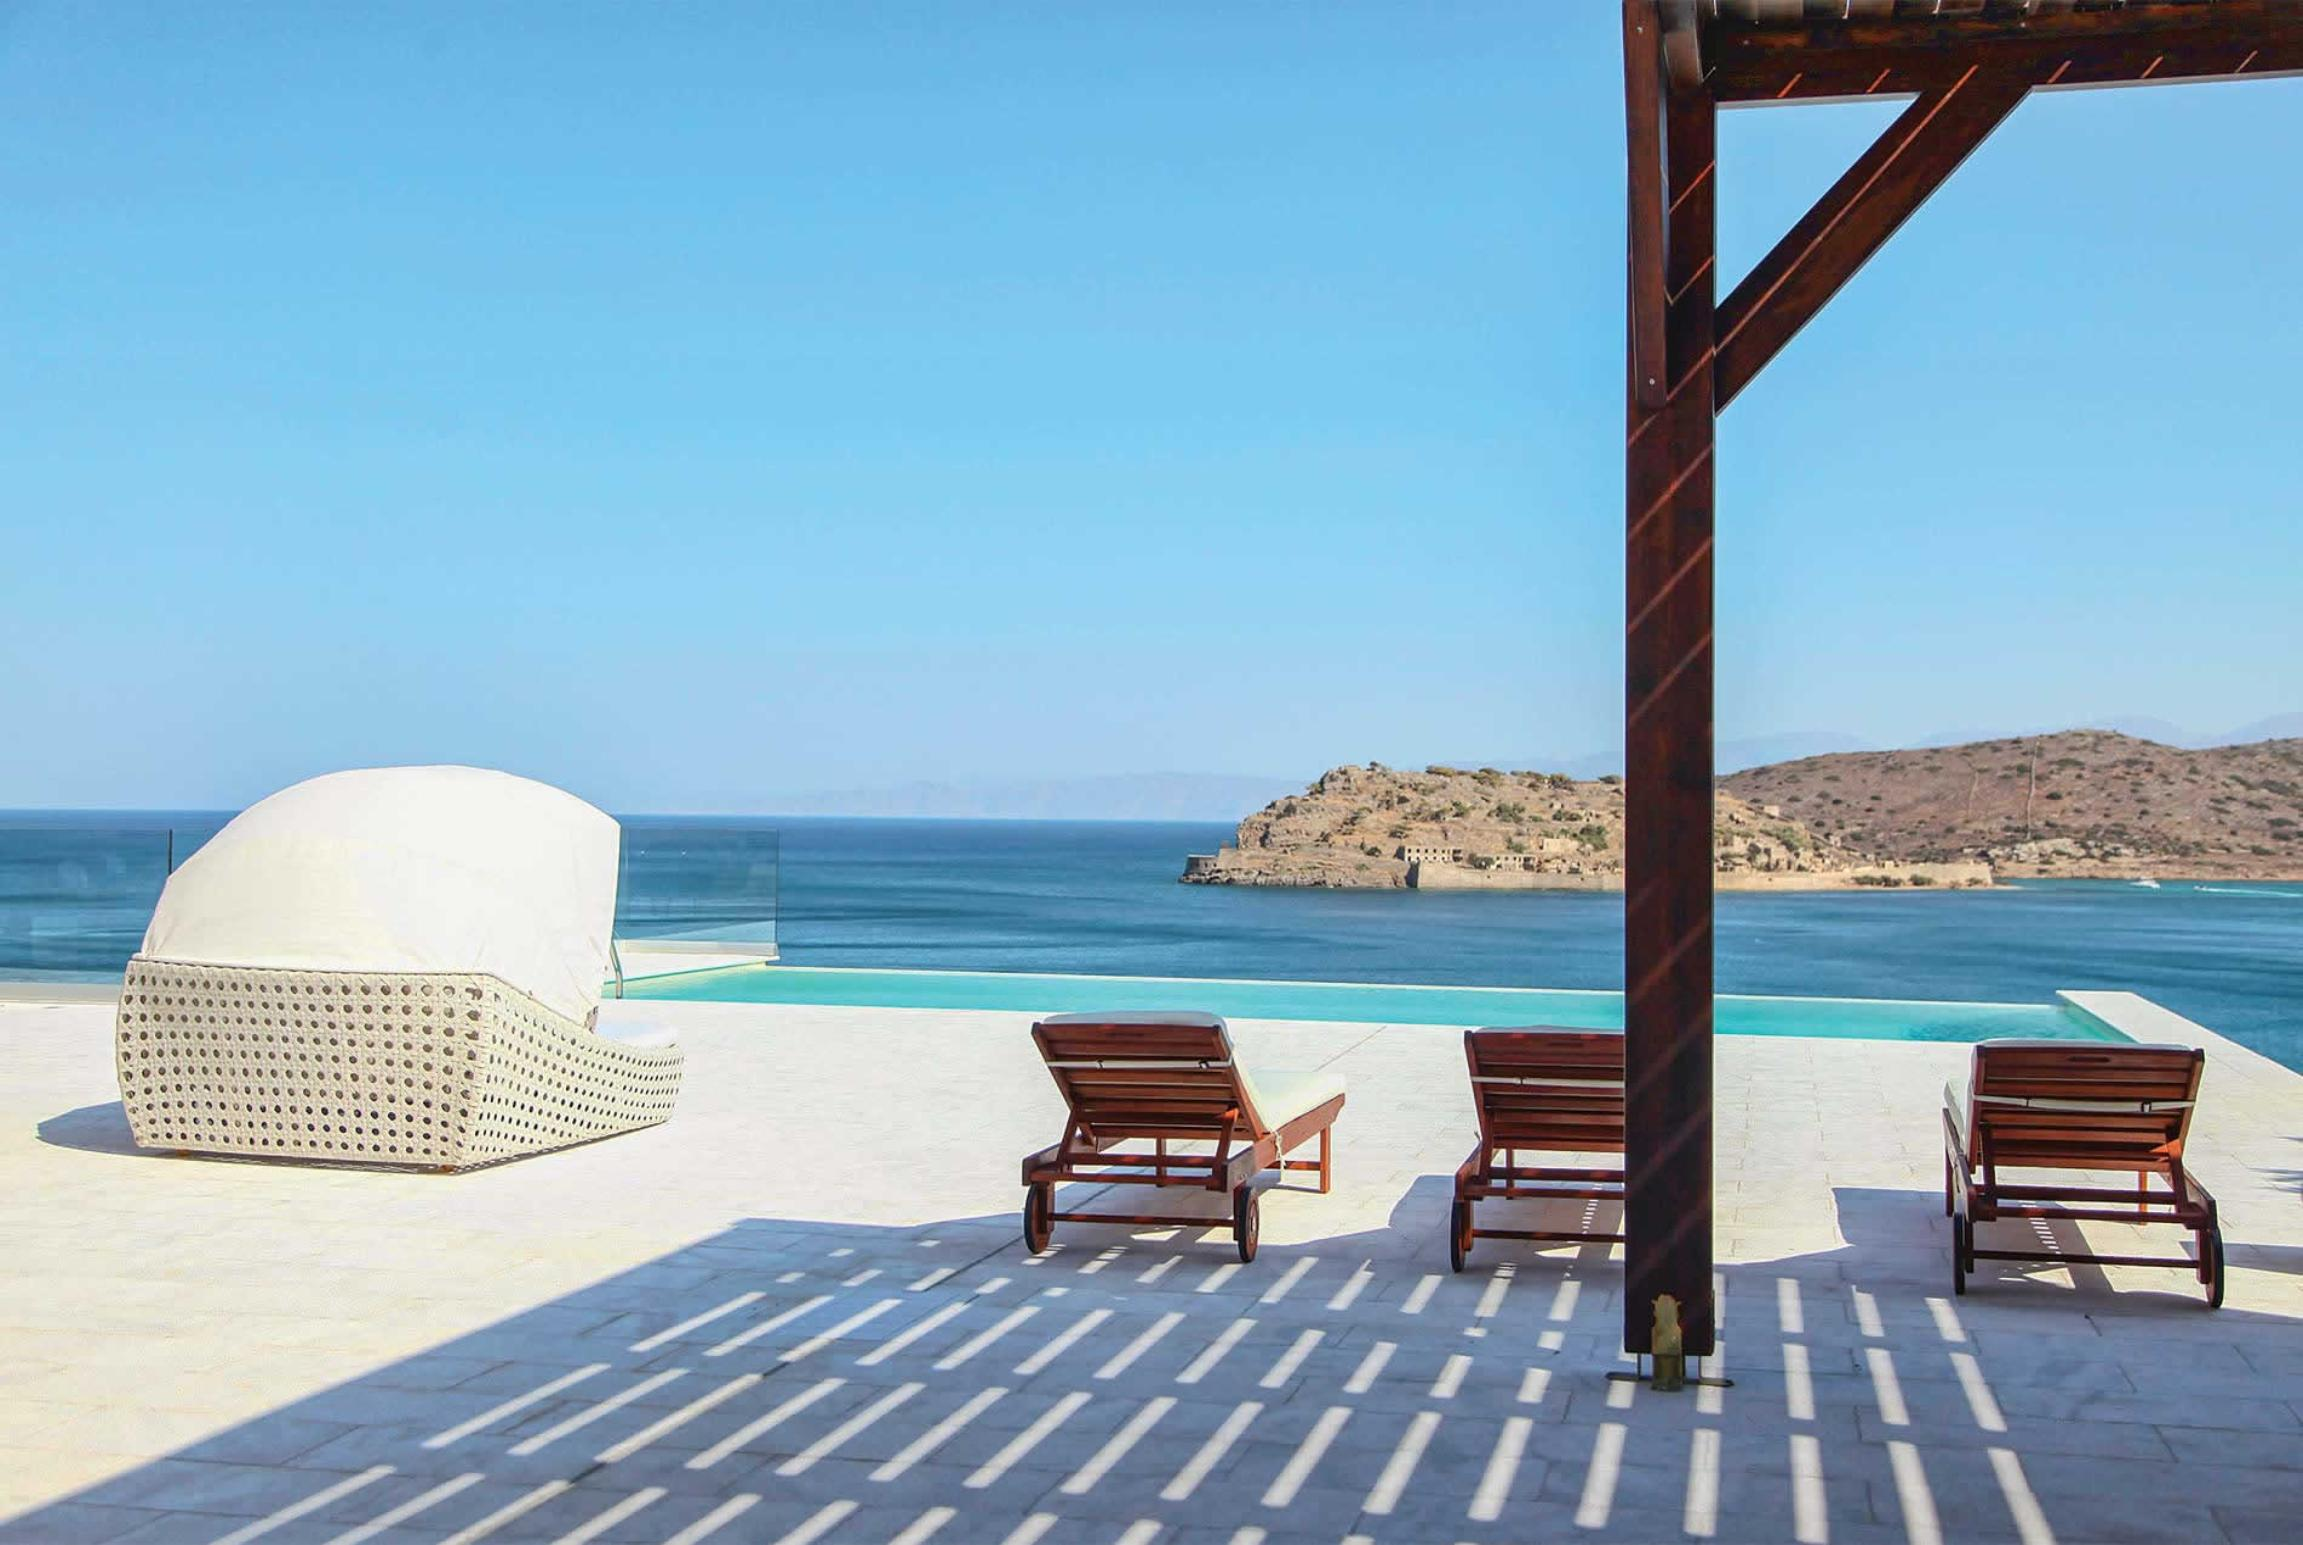 Ferienhaus Danae (2654195), Plaka, Kreta Nordküste, Kreta, Griechenland, Bild 14